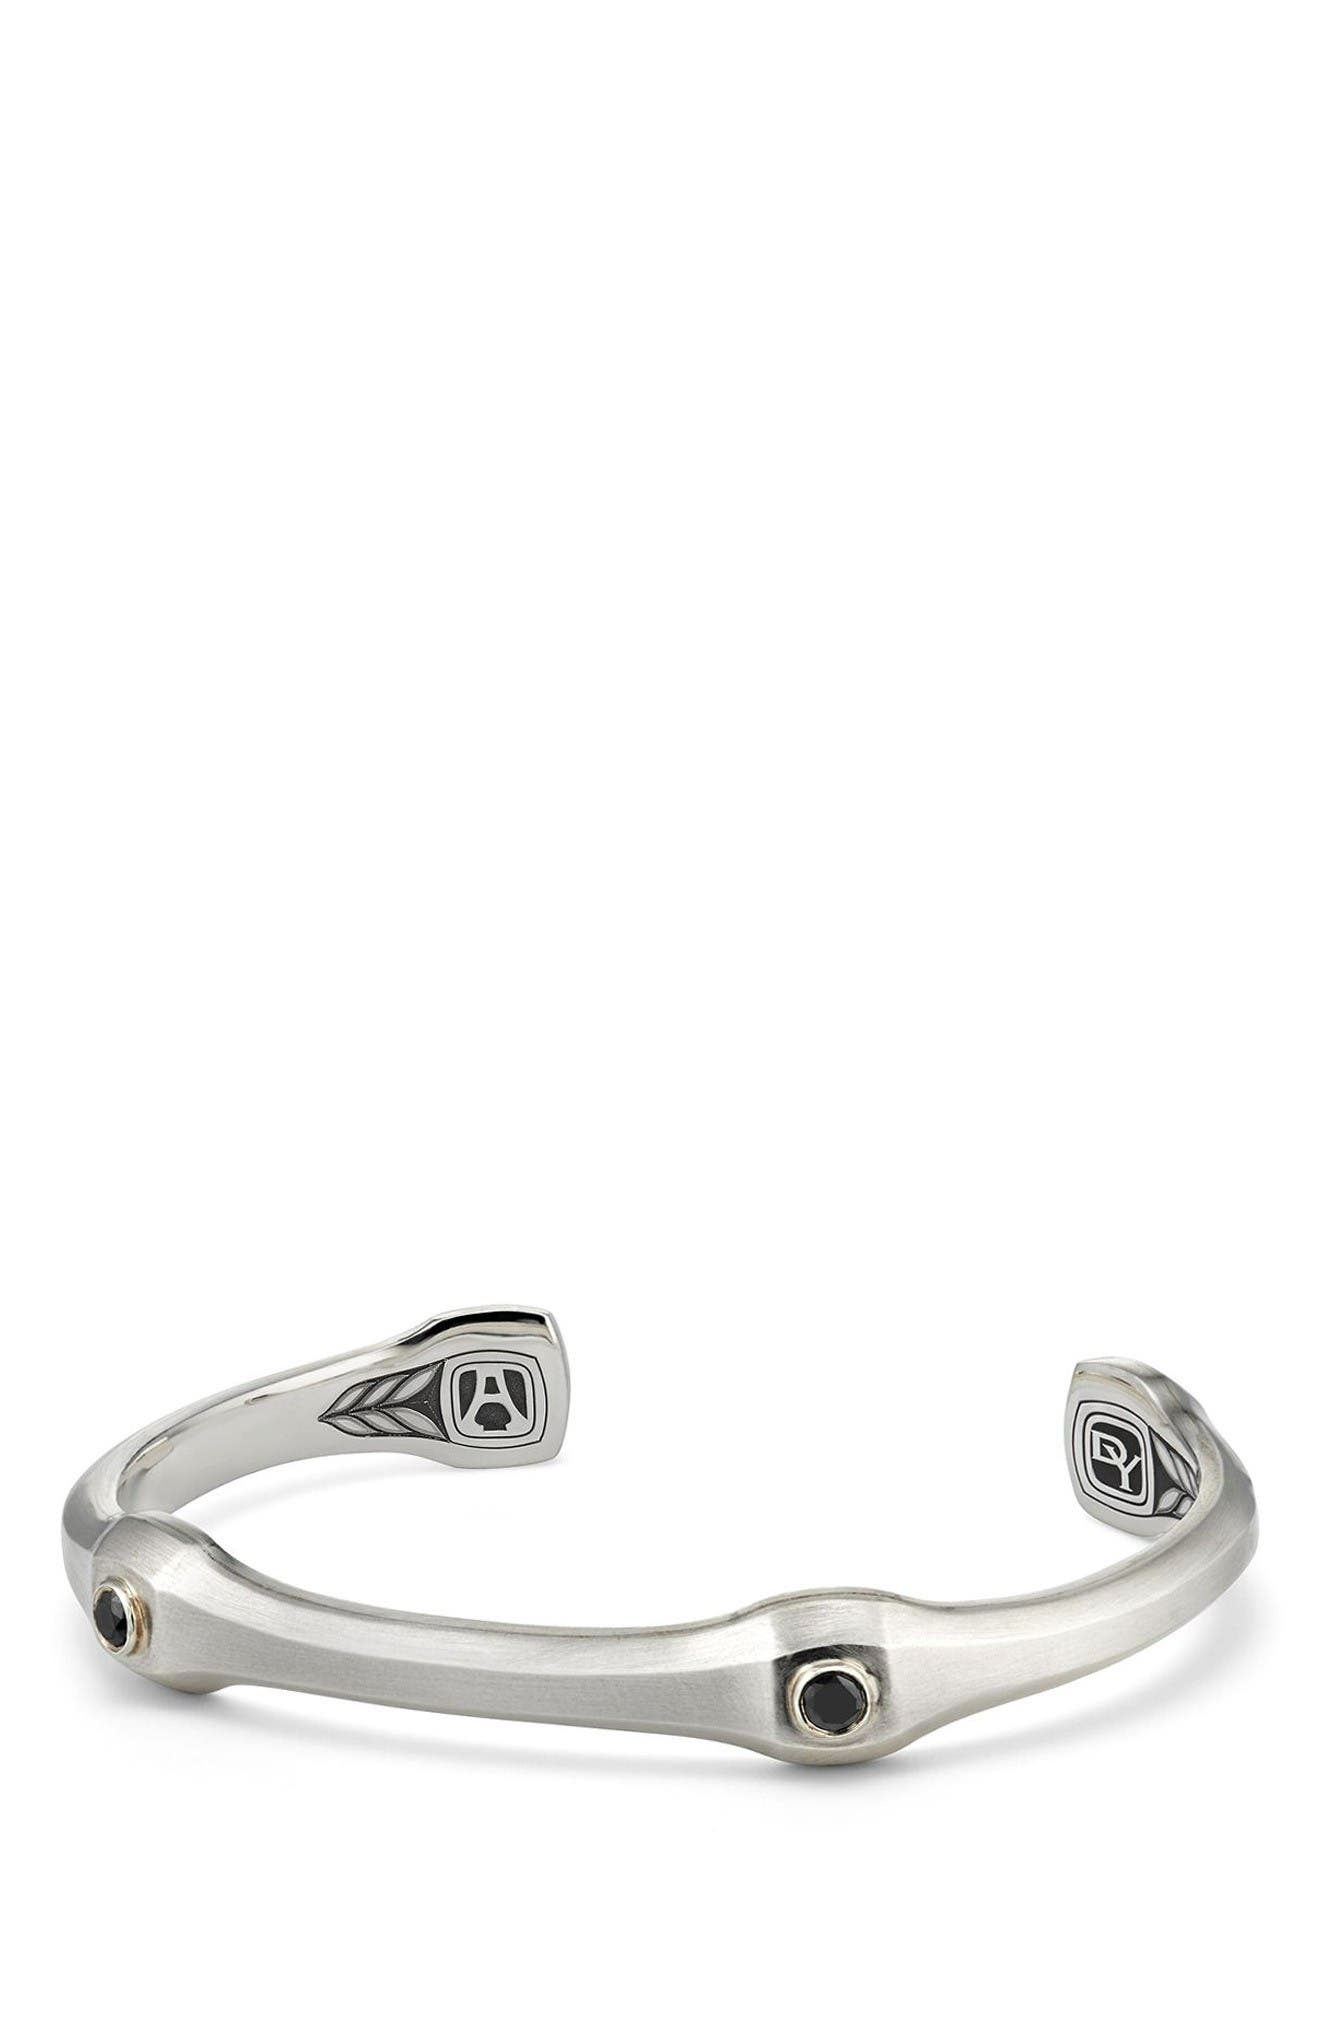 Main Image - David Yurman Anvil Cuff Bracelet with Black Diamond, 10.5mm